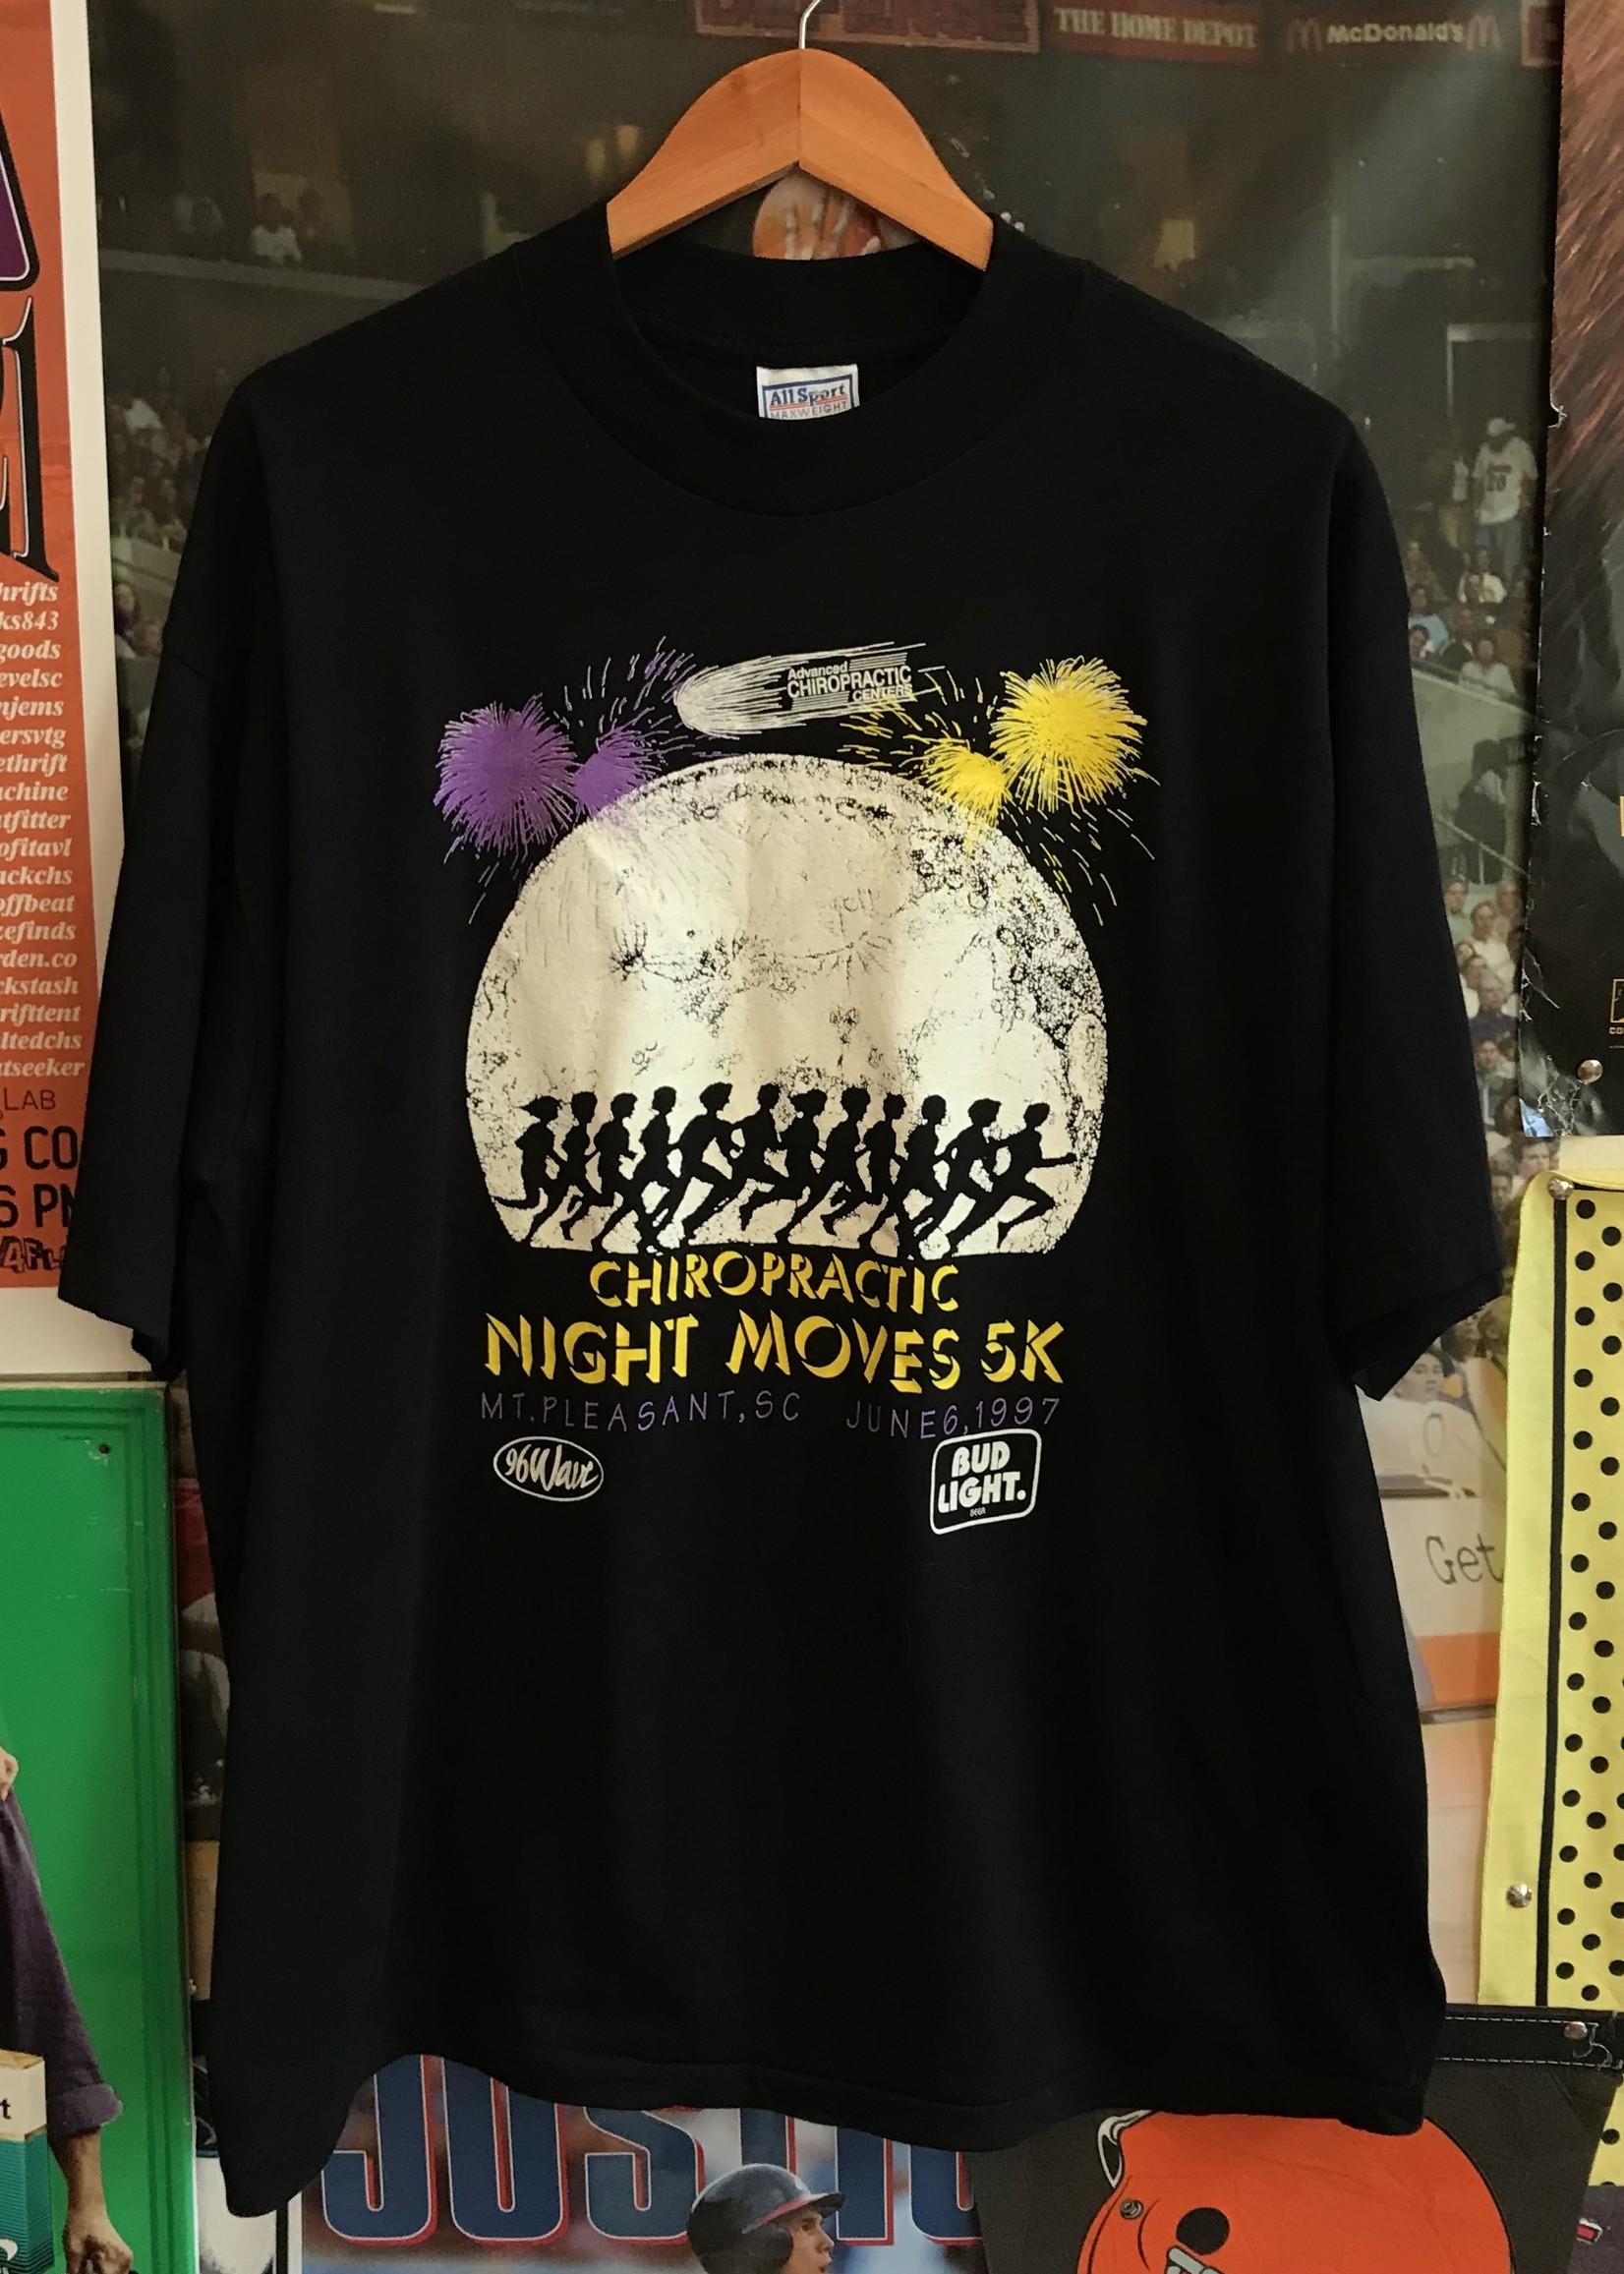 4739chiropractic night moves tee sz. XL